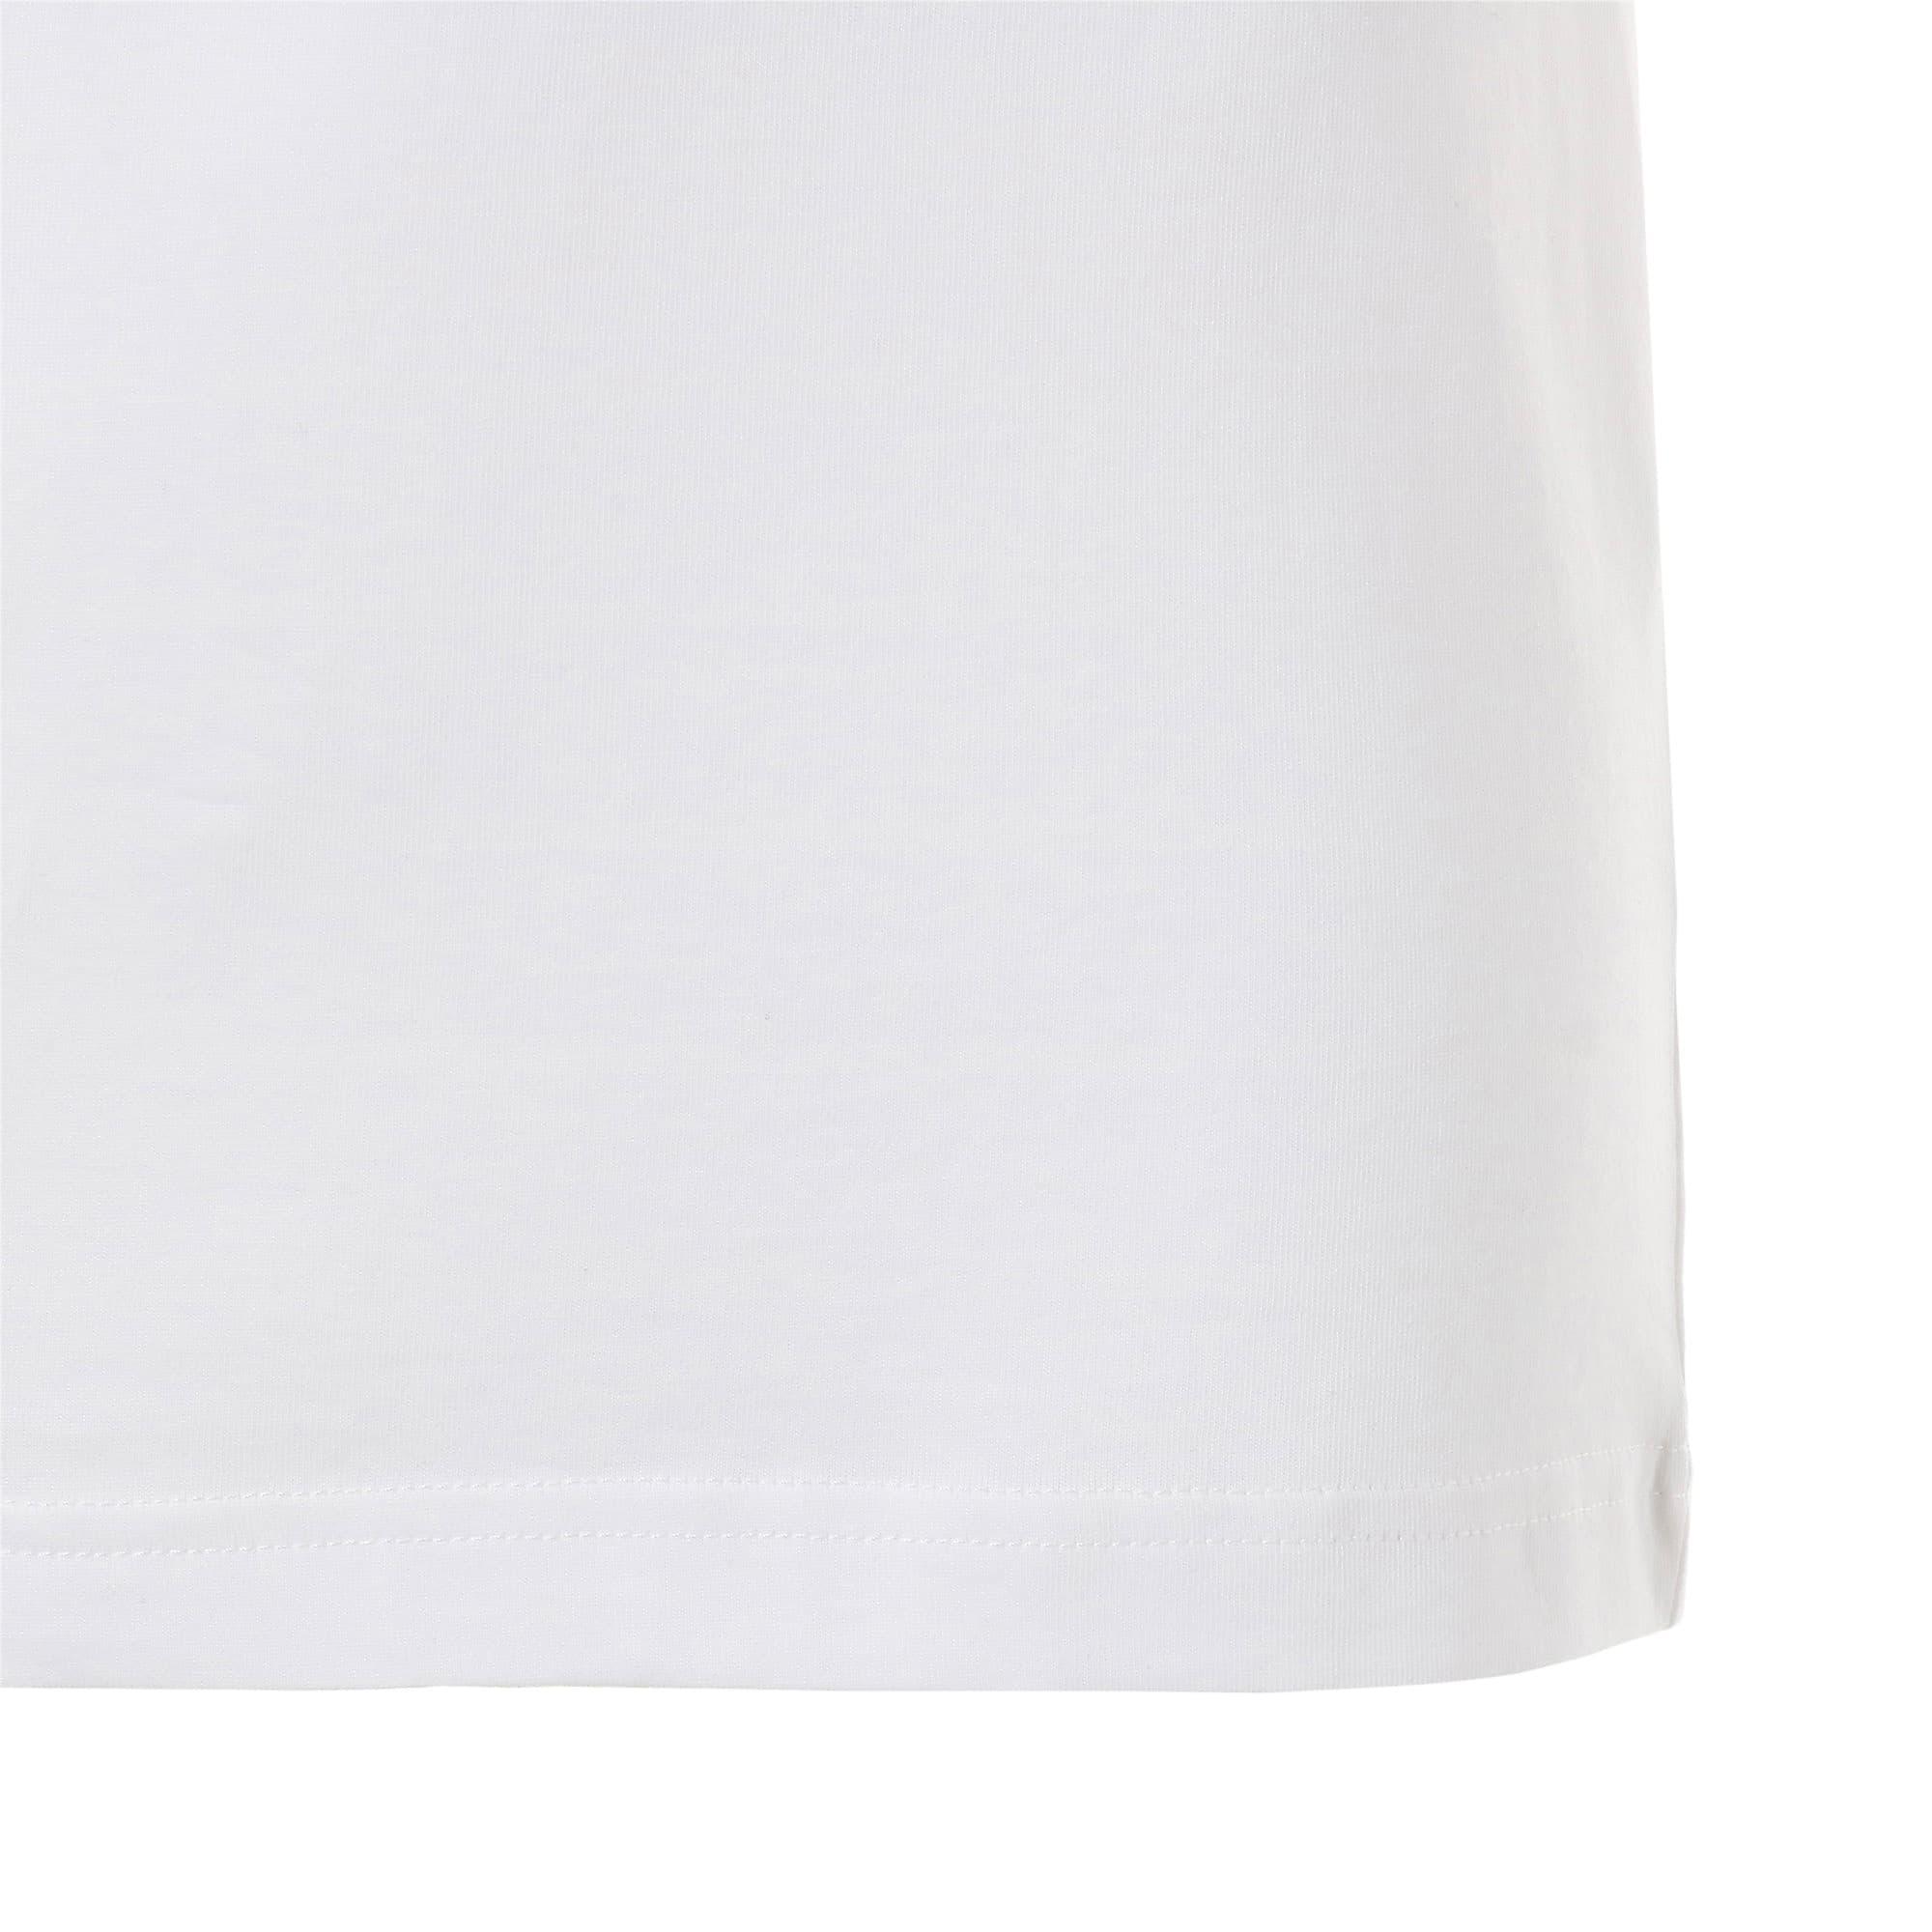 Thumbnail 9 of CLASSICS ロゴ SS Tシャツ 半袖, Puma White, medium-JPN